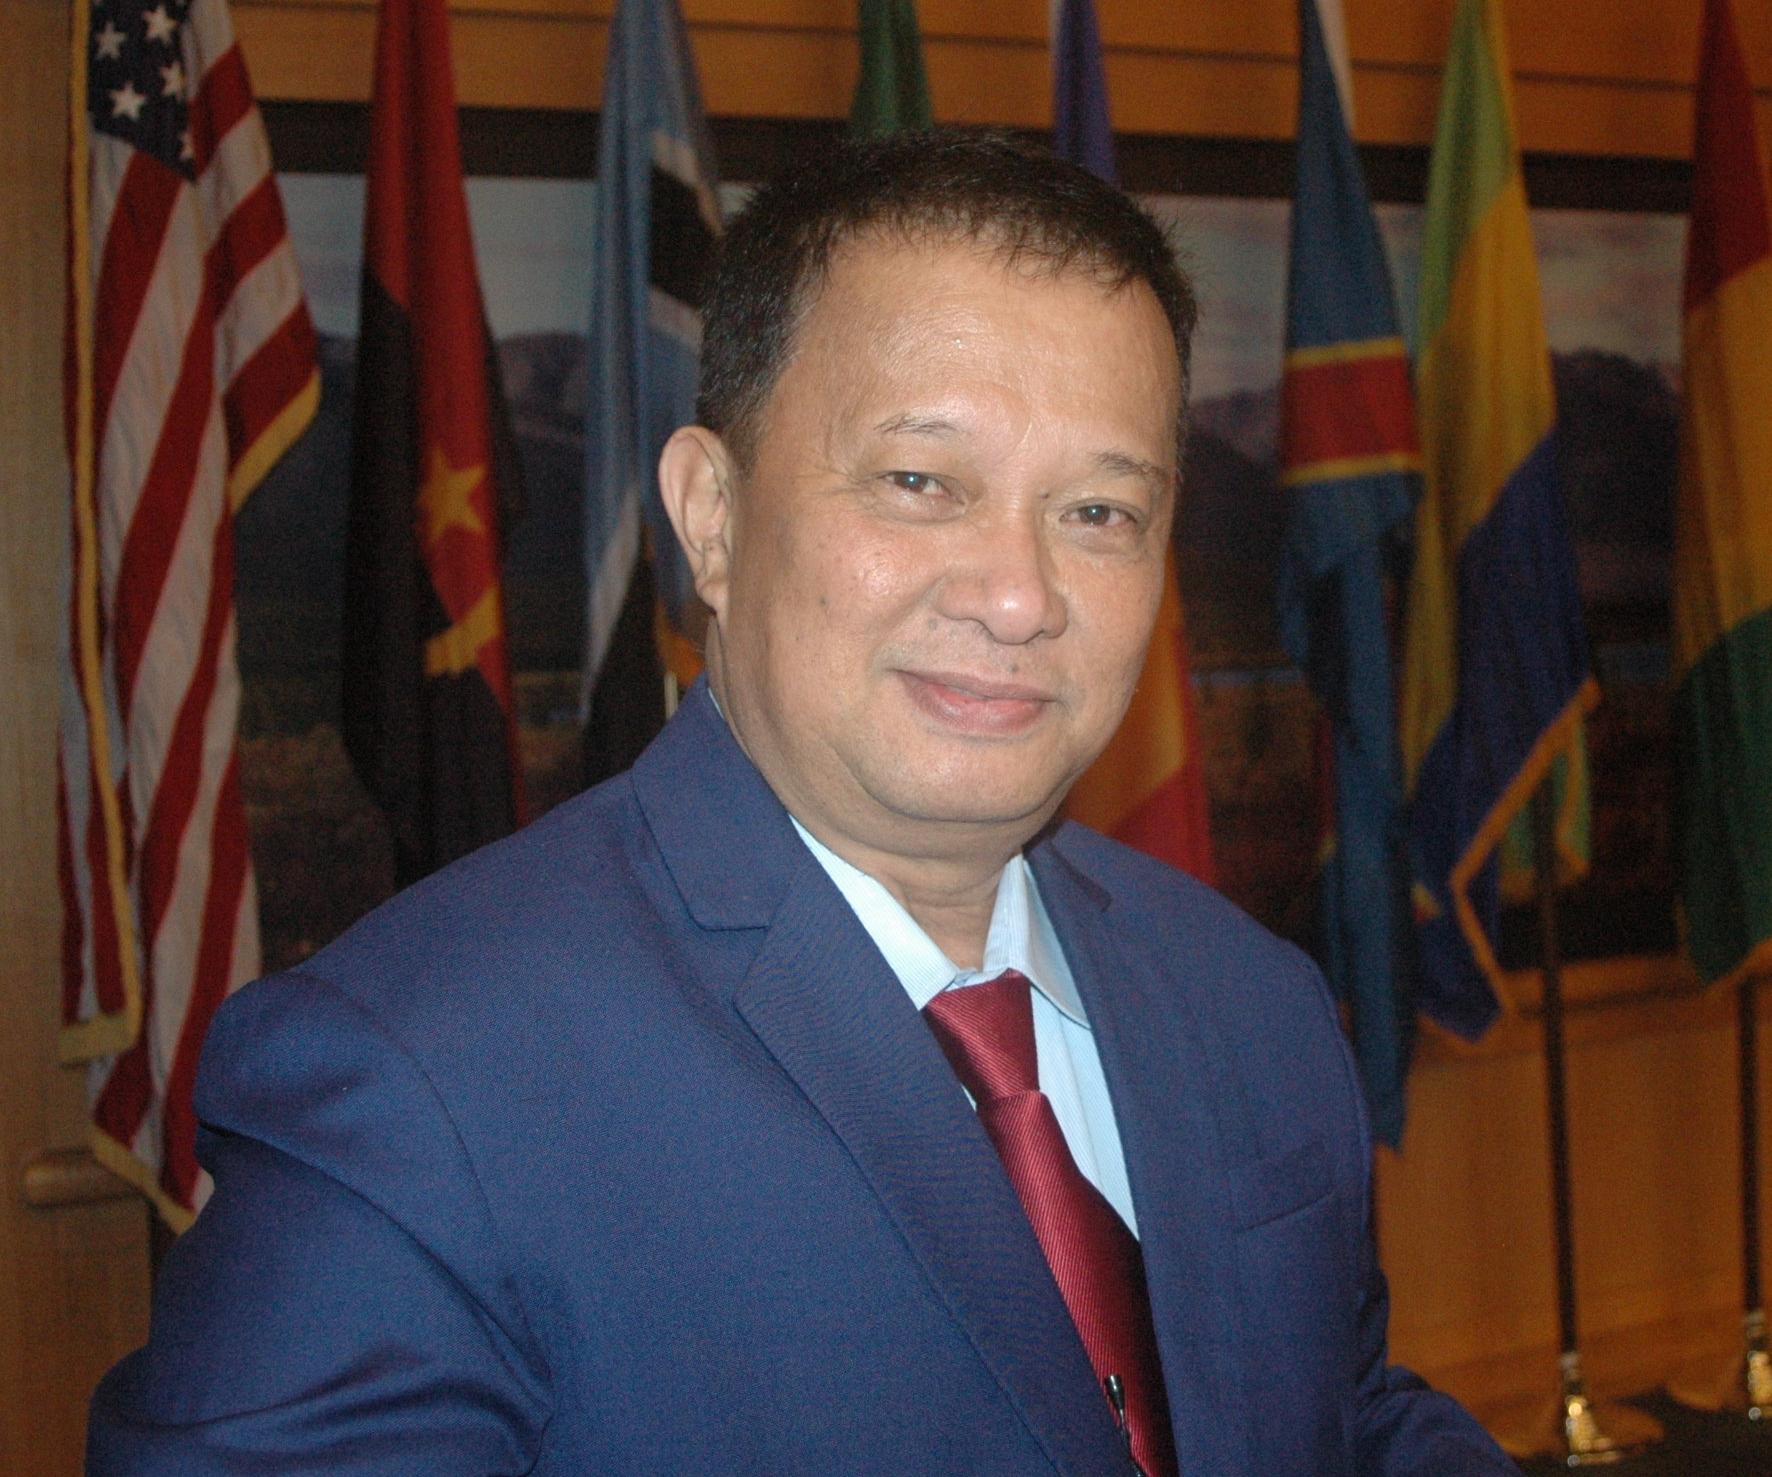 Roberto Oliva, Executive Director of ASEAN Centre for Biodiversity